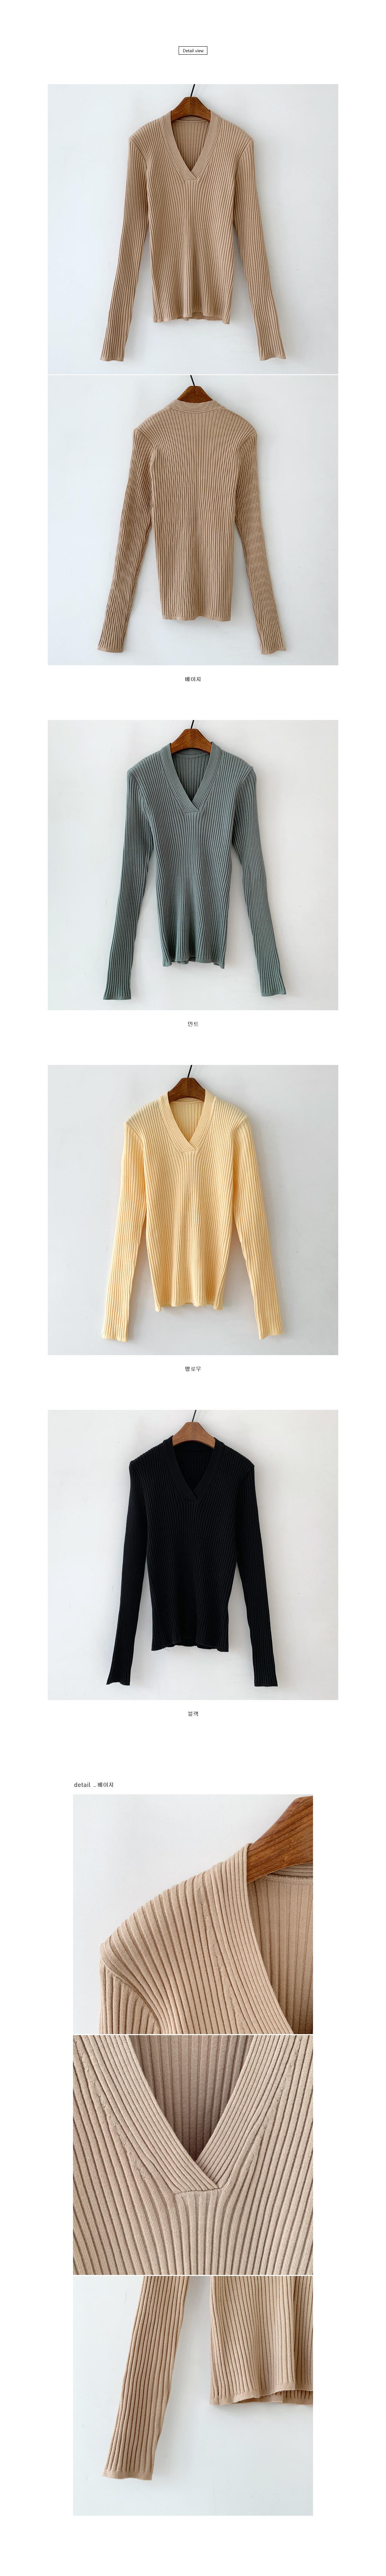 Believe Slim Corrugated V Neck Knit